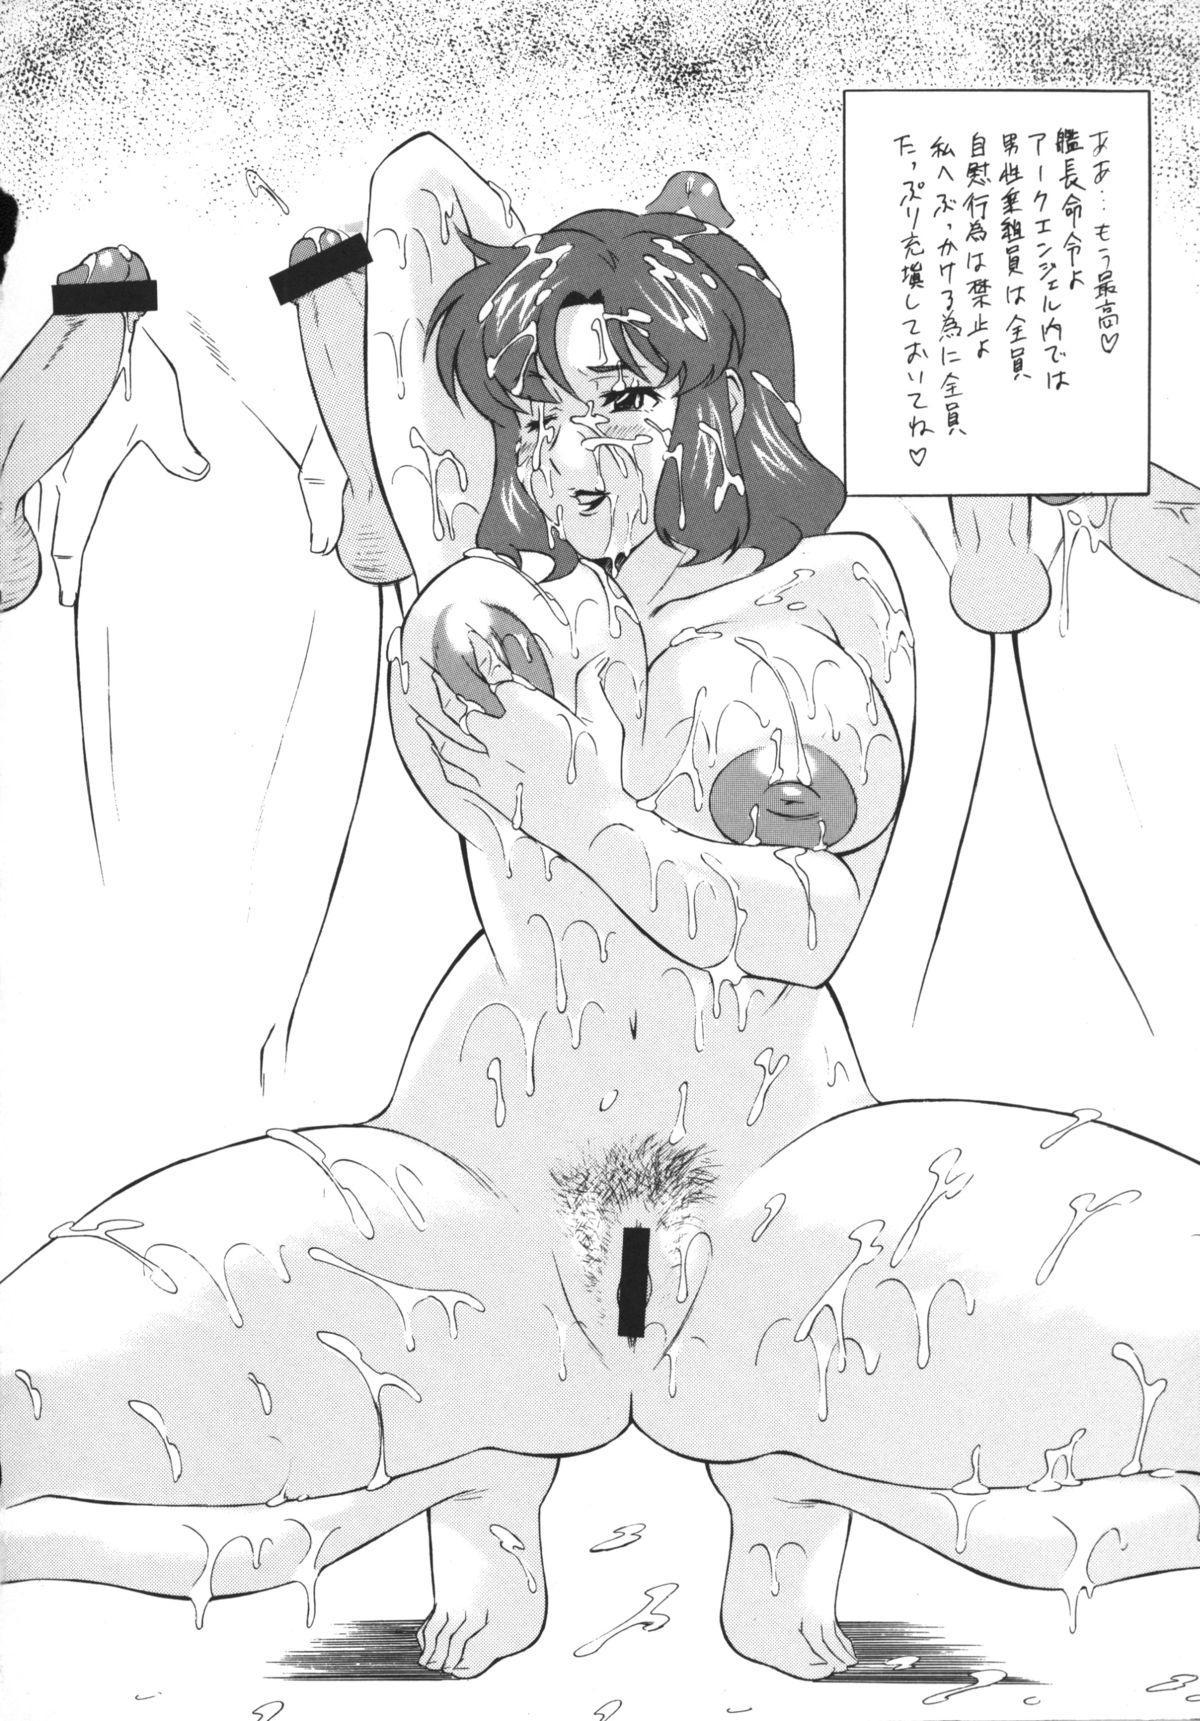 [Okachimentaiko (H-H, Minazuki Akira) Oh! Hentai (Various) 32